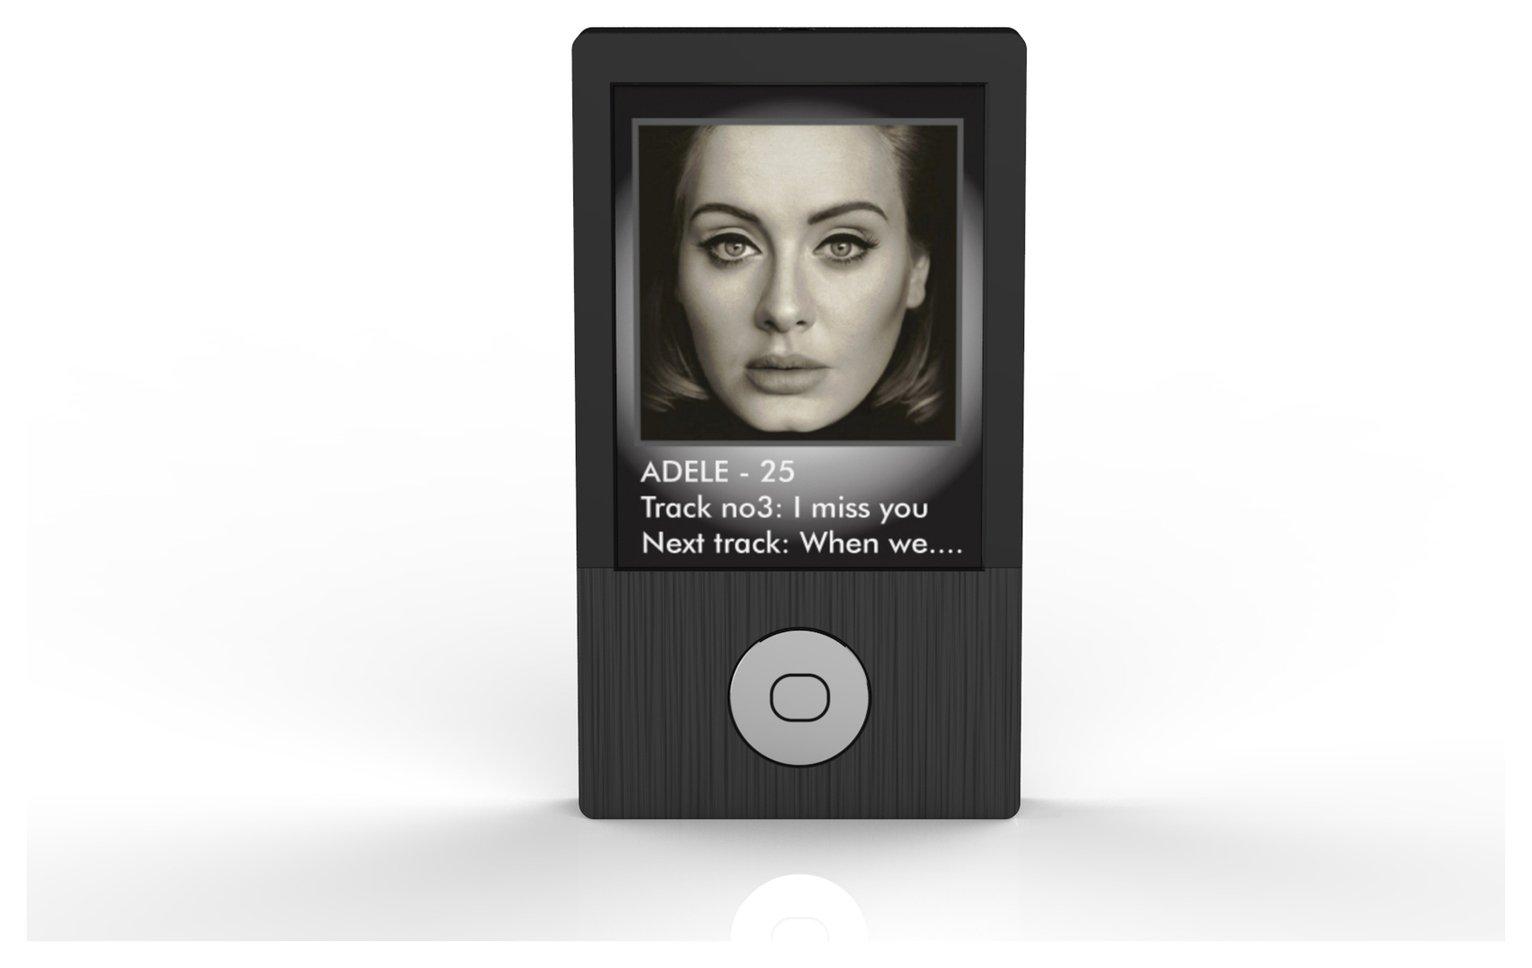 Bush 16GB MP3 Player With Bluetooth- Black